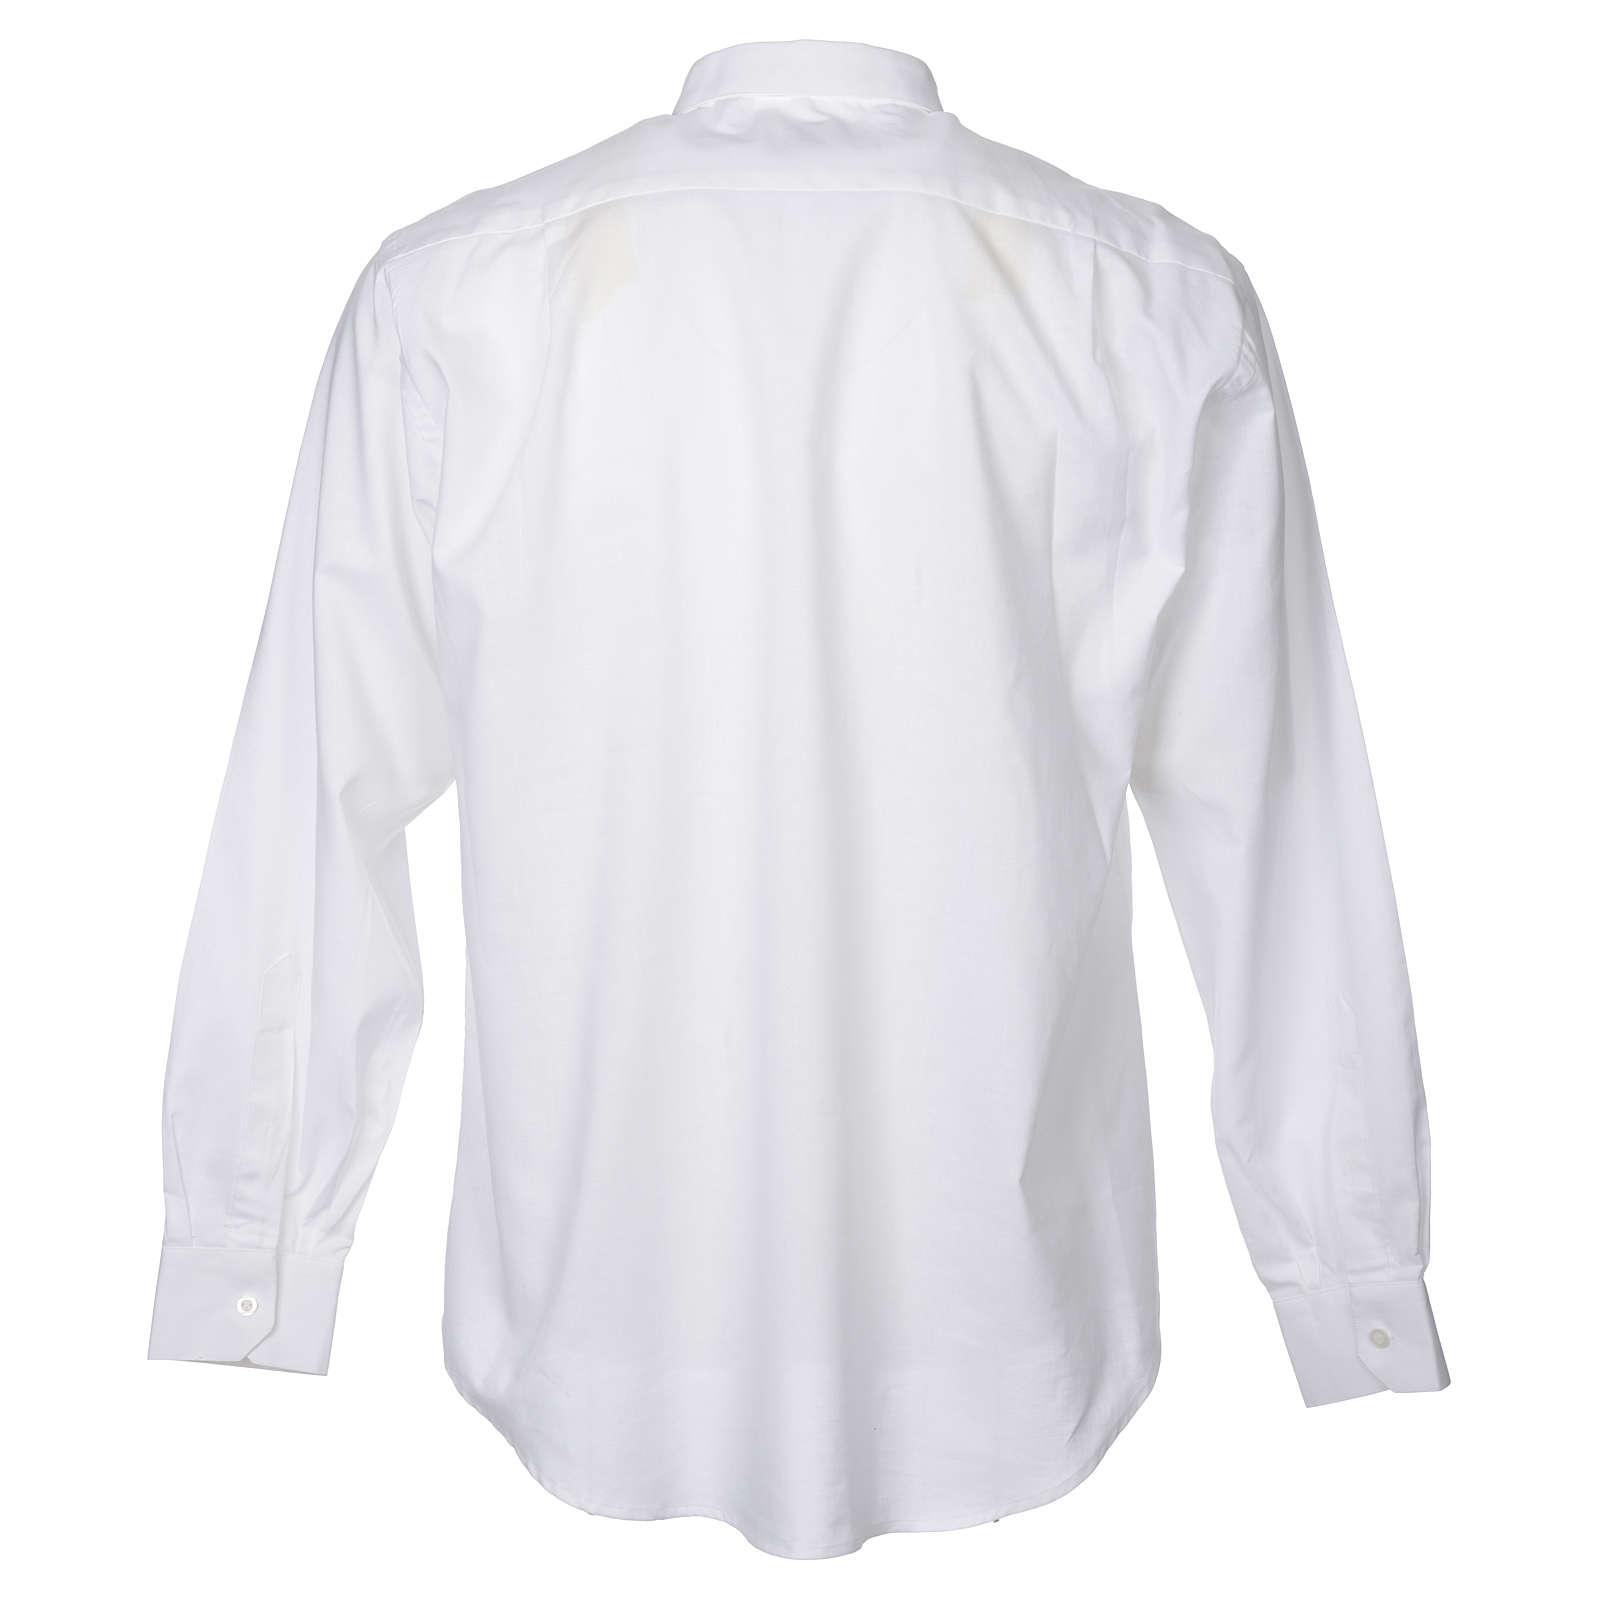 STOCK Camicia clergy manica lunga misto bianca 4